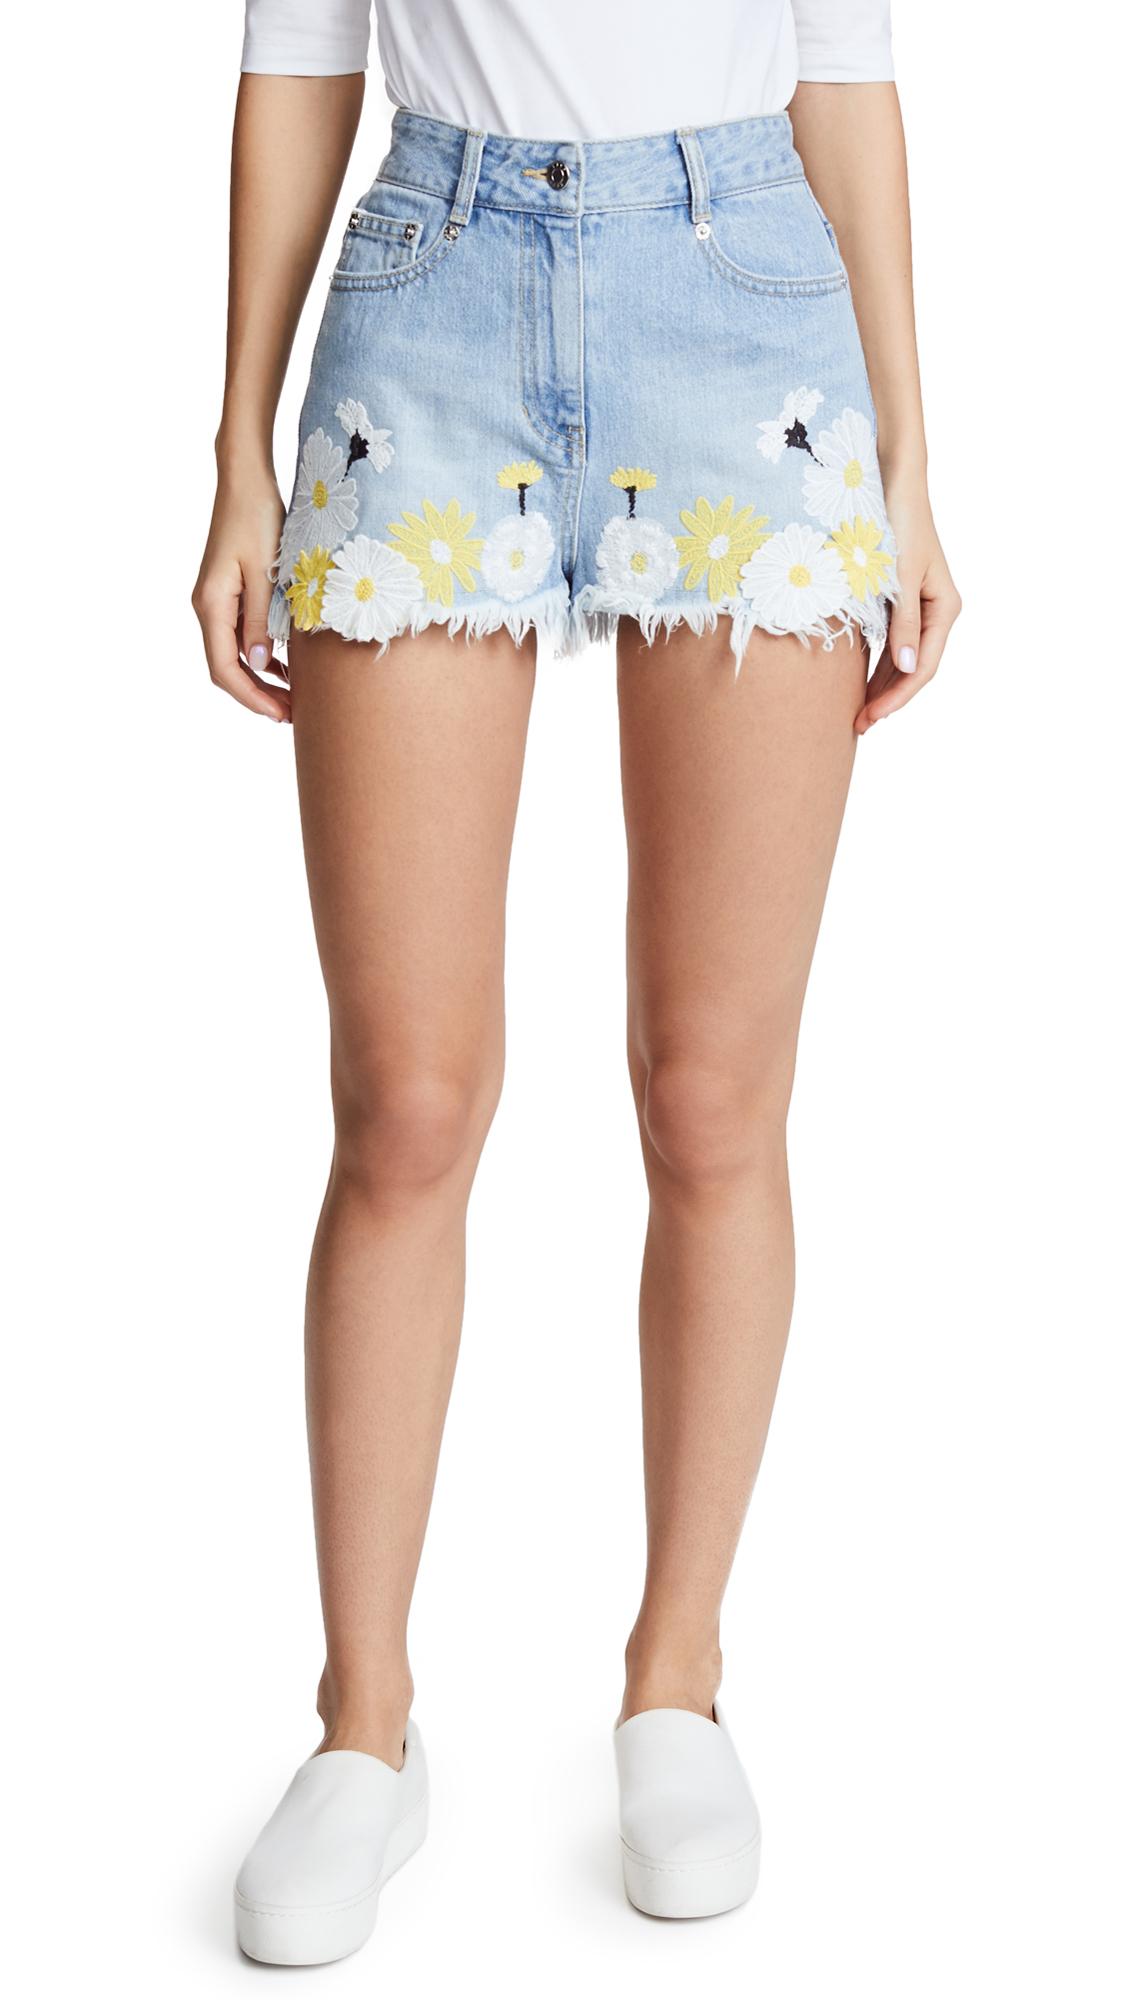 SJYP Flower Embroidery Denim Shorts - Light Blue